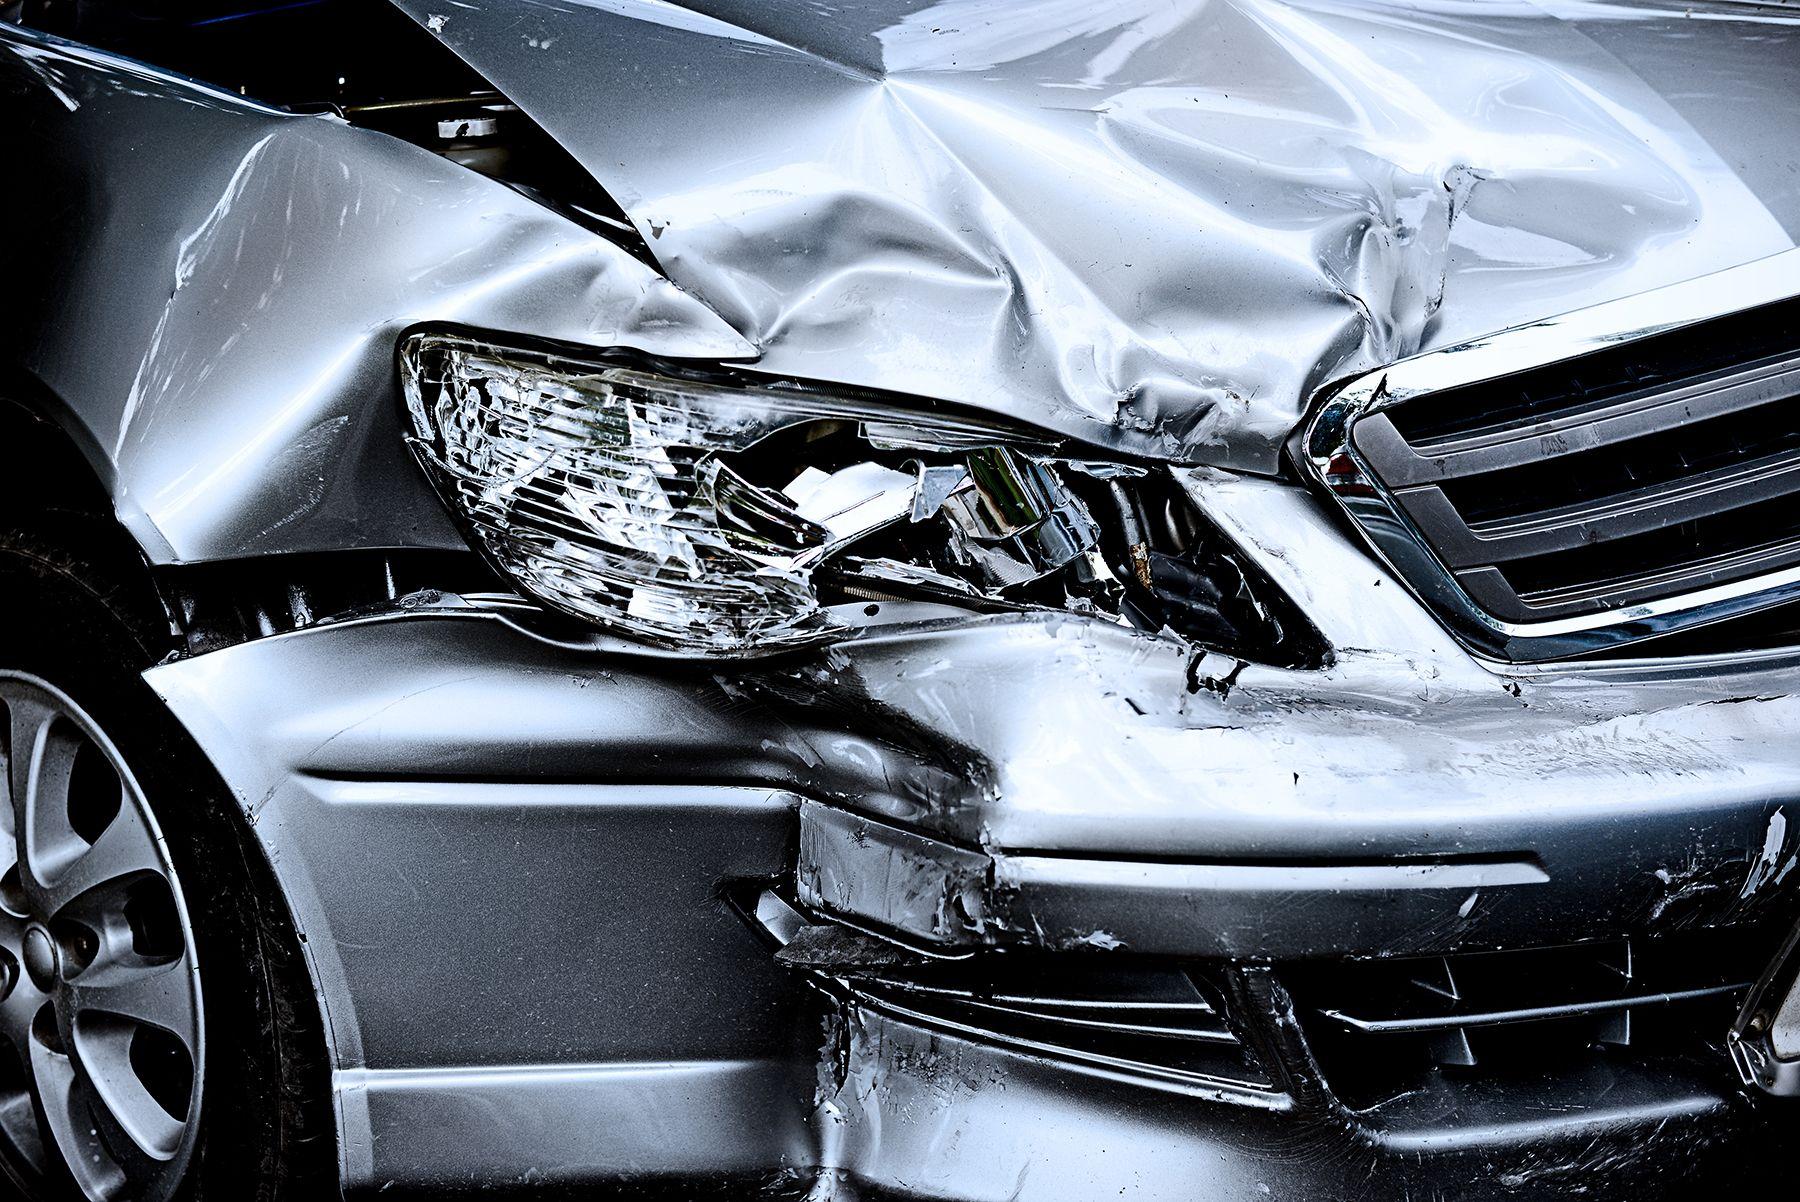 A crashed car